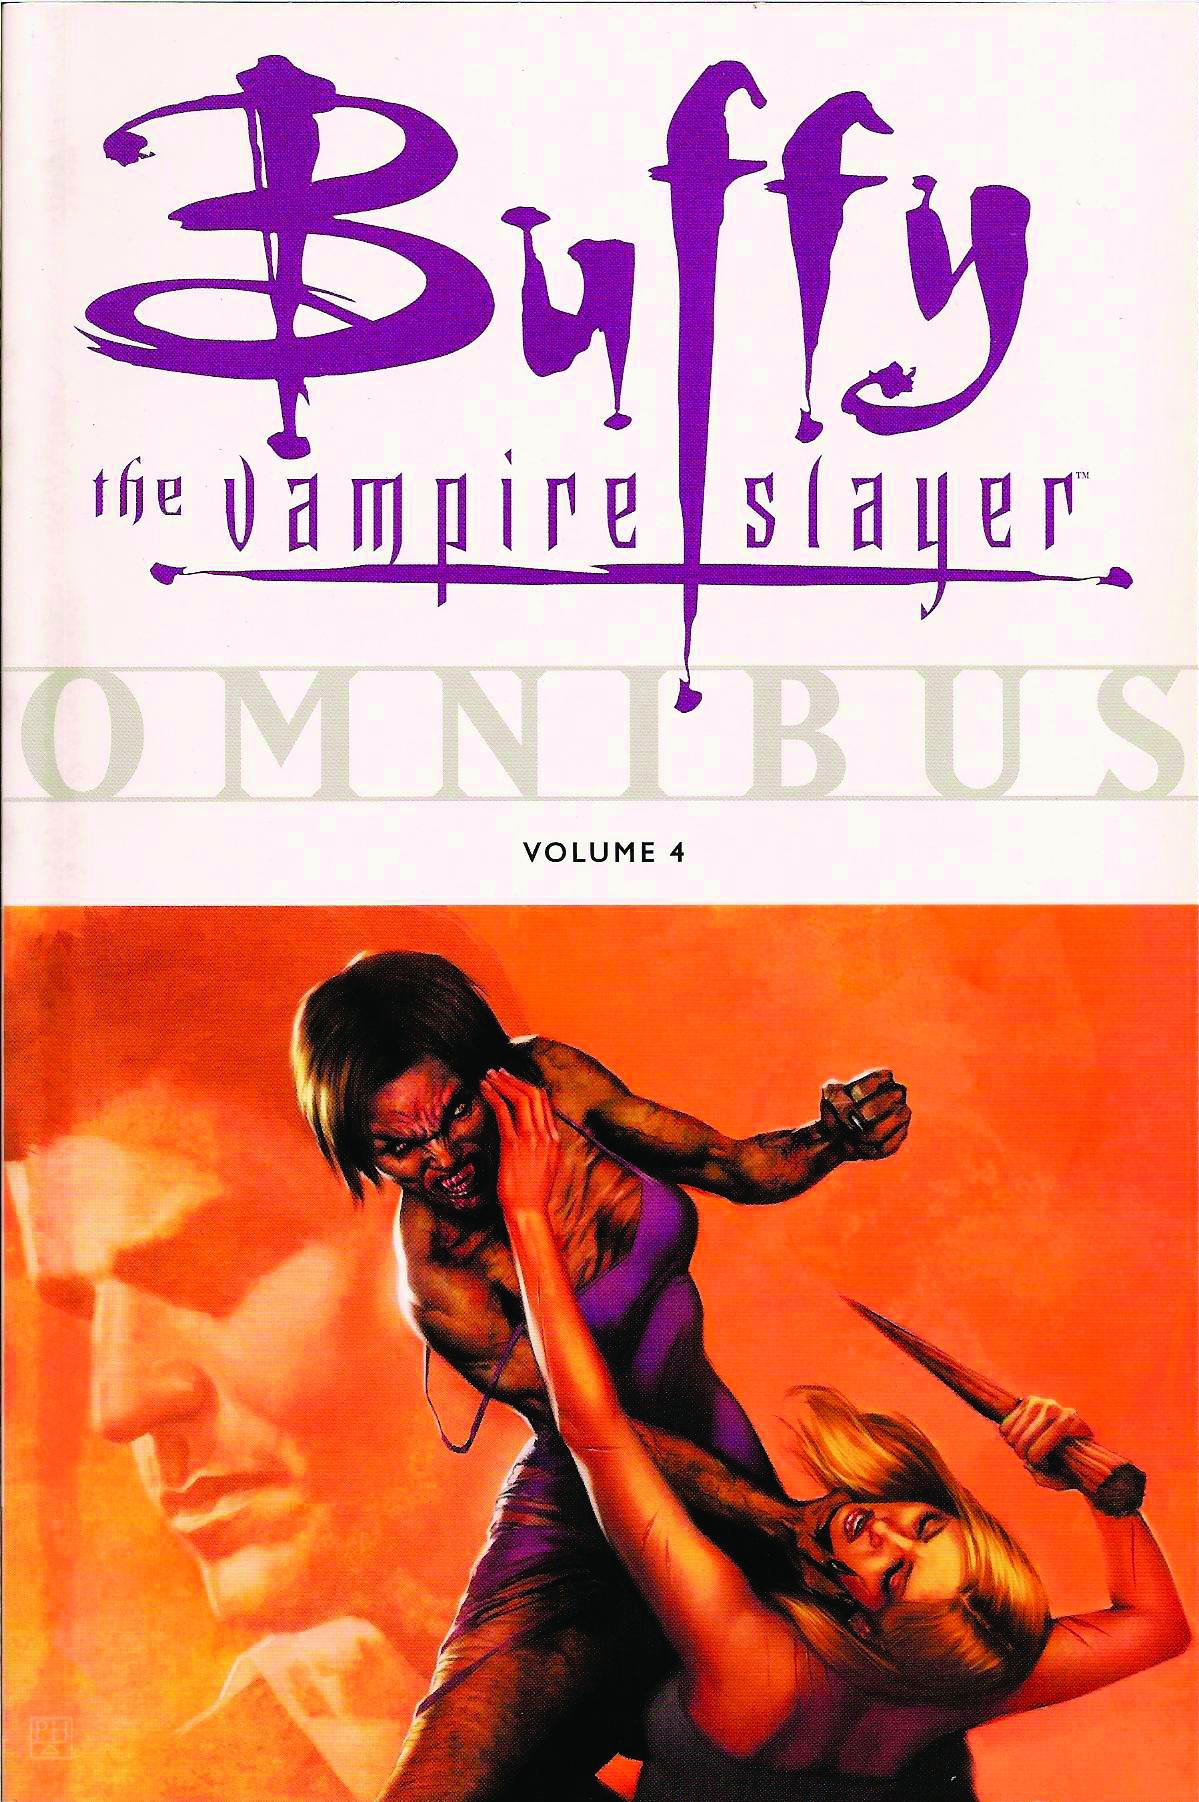 BUFFY THE VAMPIRE SLAYER OMNIBUS TP VOL 04